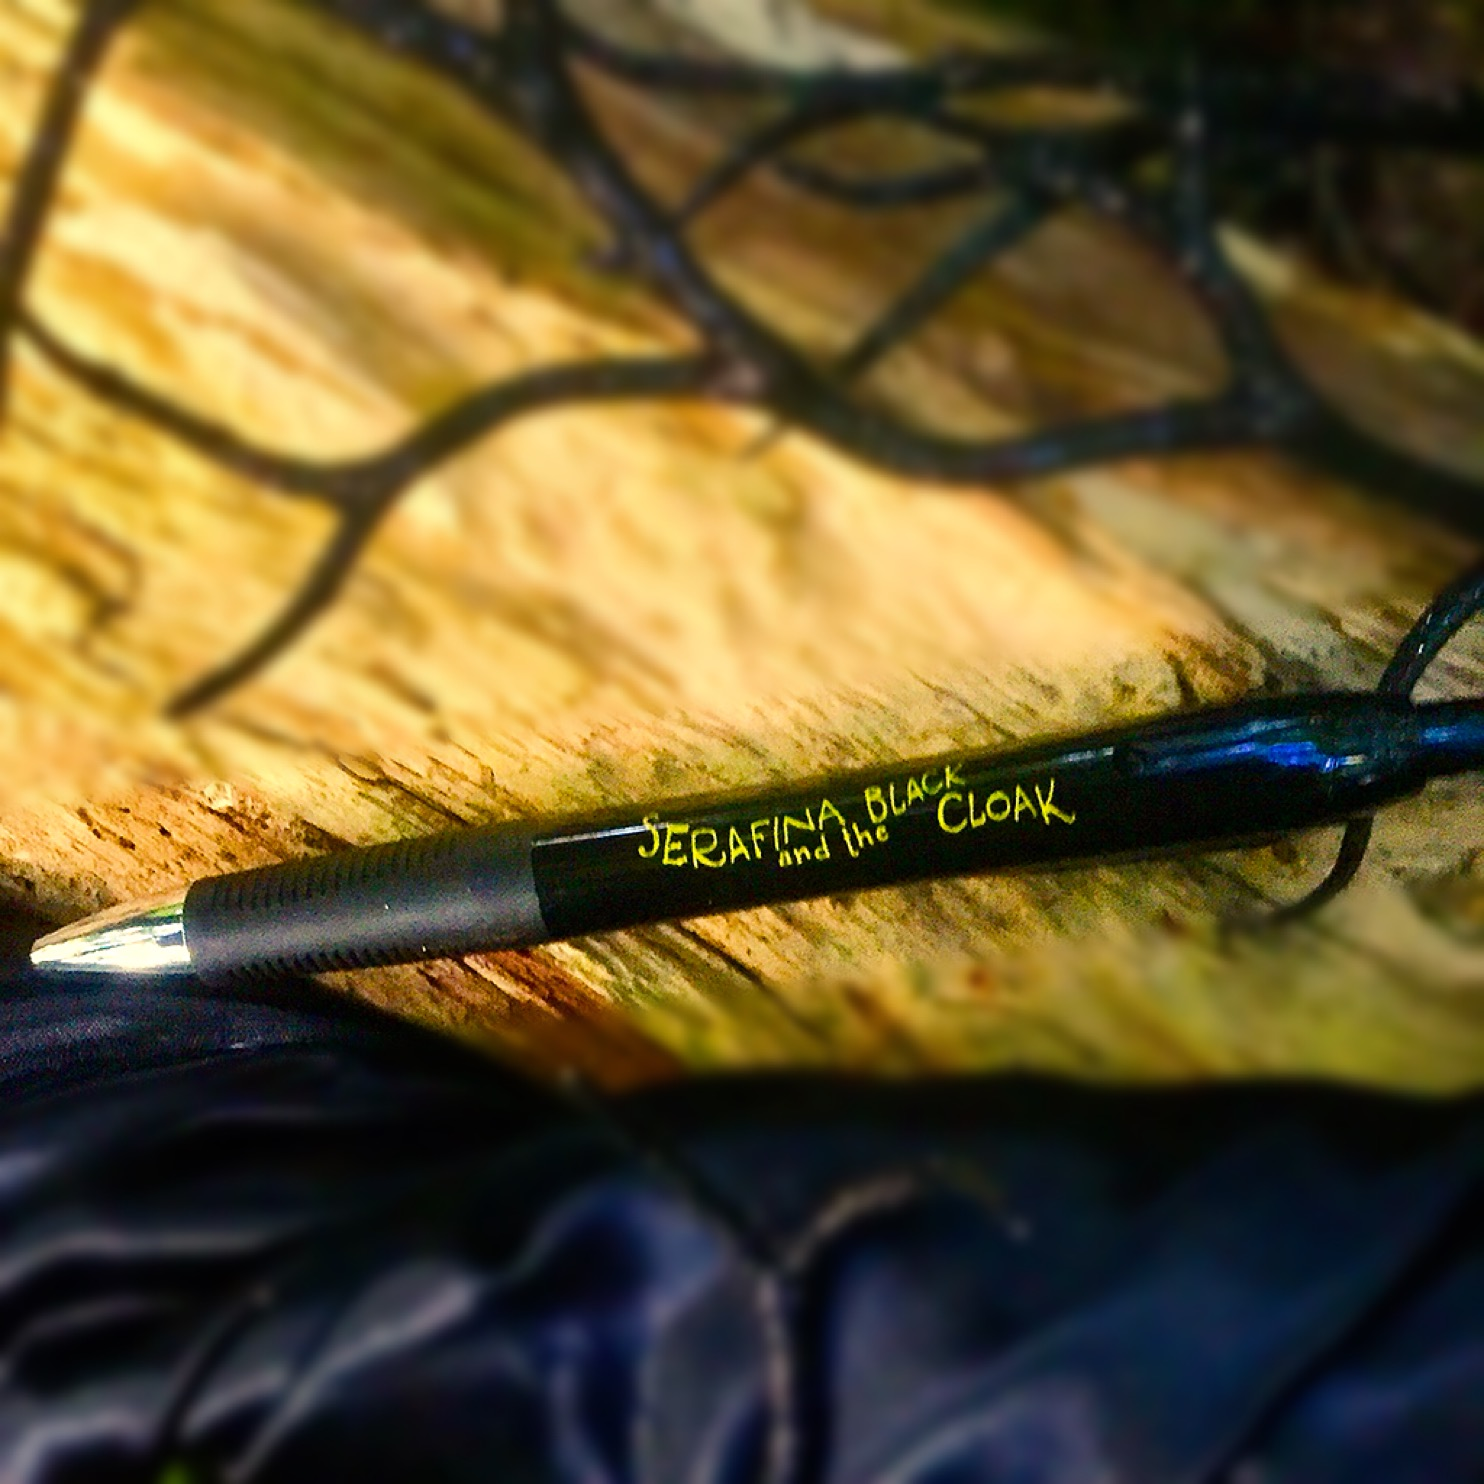 serafina-and-the-black-cloak-writing-pen-robert-beatty-biltmore-asheville-disney-hyperion